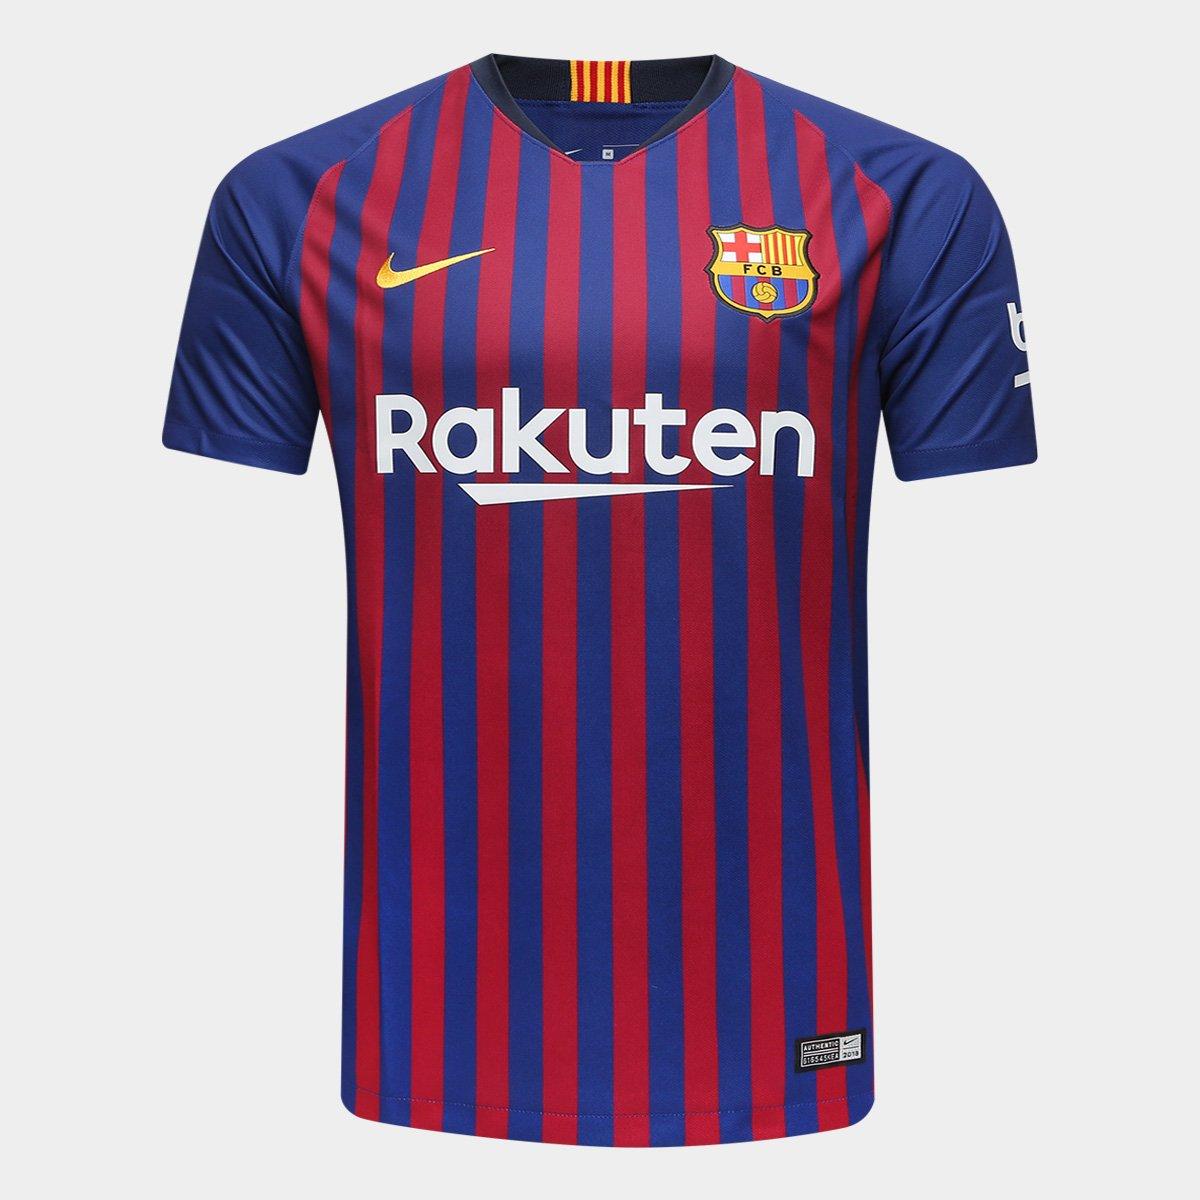 364074e66 Camisa Barcelona Home 2018 s n° Torcedor Nike Masculina - Azul e Grená -  Compre Agora